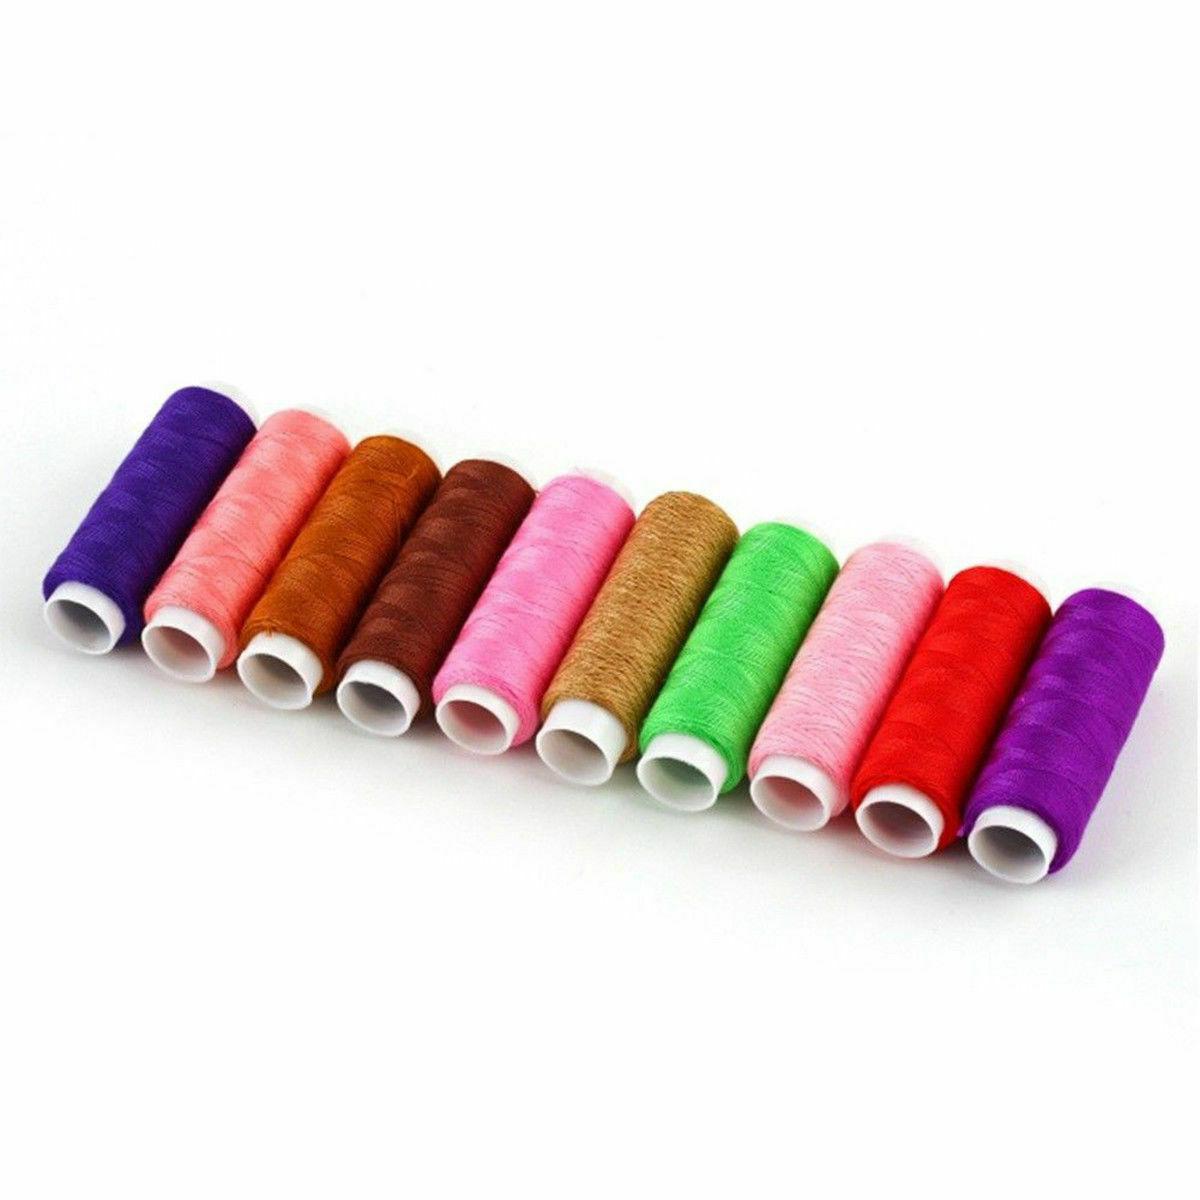 64 Line thread Spool Set Bobbin Cotton Reel Needle Tape